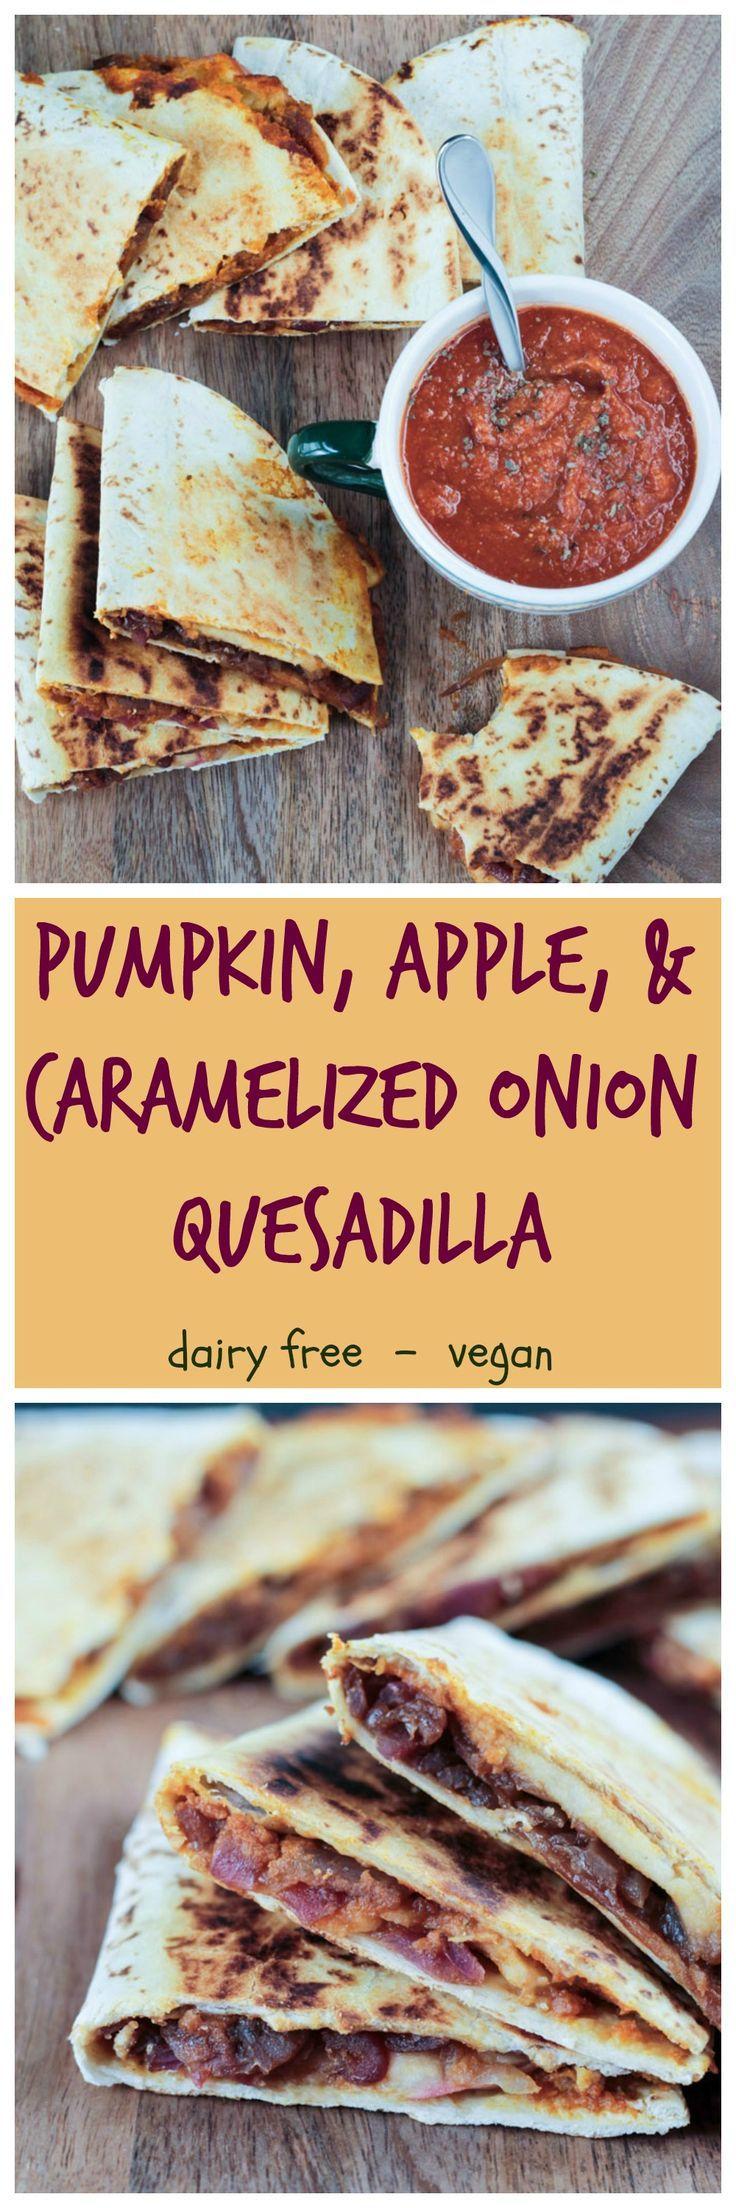 Pumpkin, Apple & Caramelized Onion Quesadilla - crispy, creamy, sweet, smoky, spicy - a little piece of fall heaven!